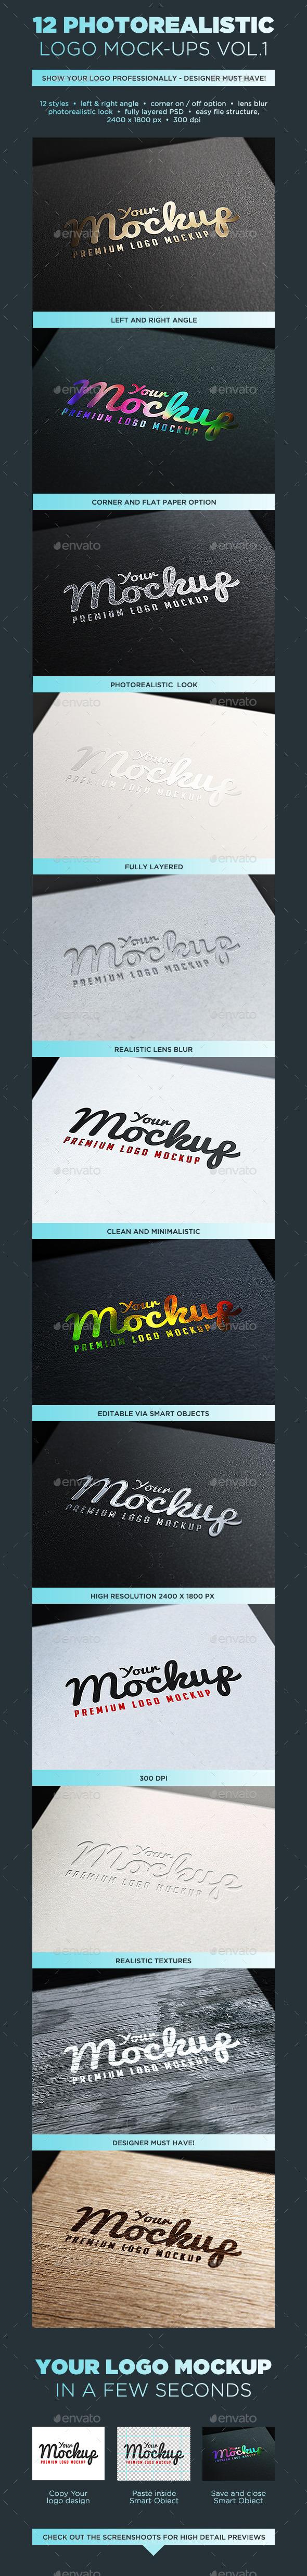 Your Mockup - Logo Mockups VOL.1 - Logo Product Mock-Ups